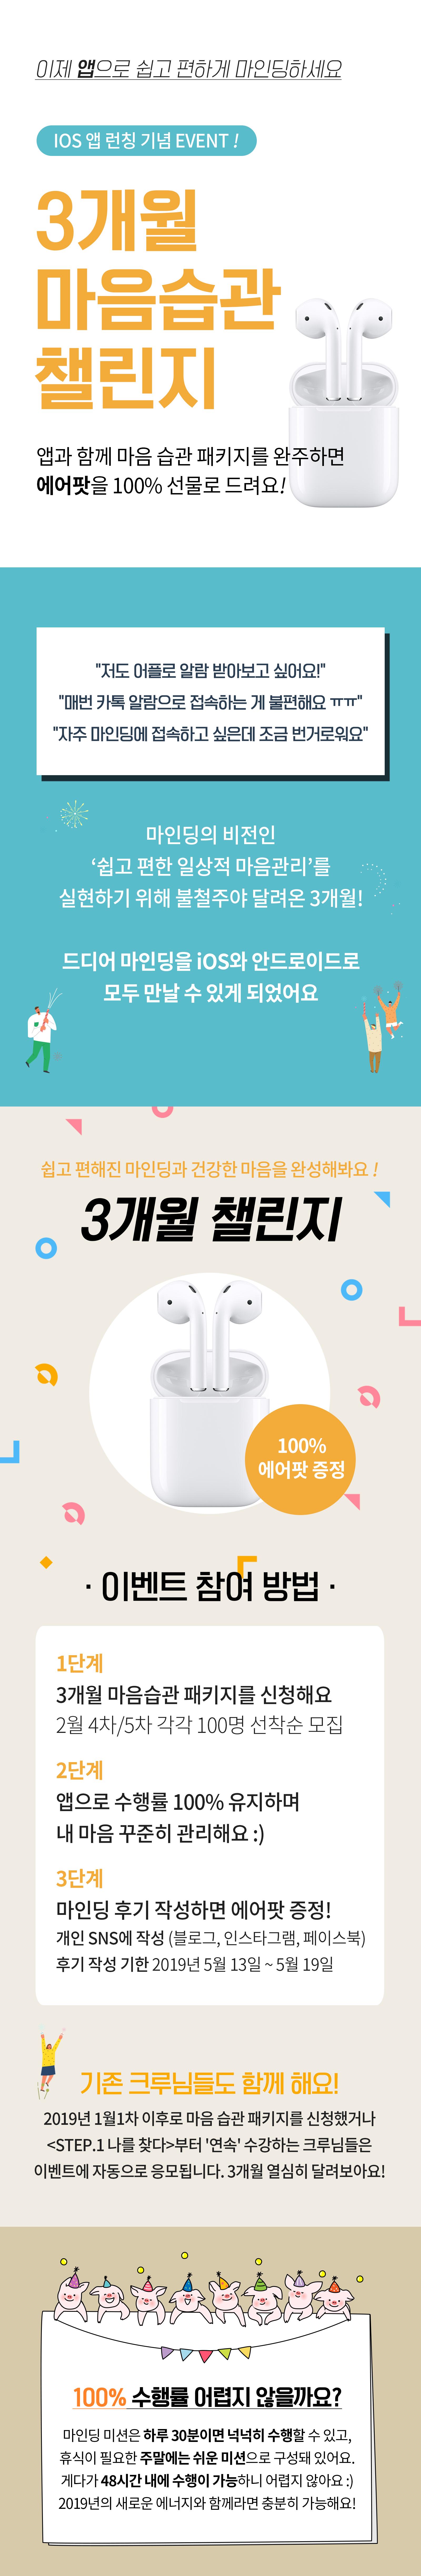 iOS 앱 출시 이벤트1